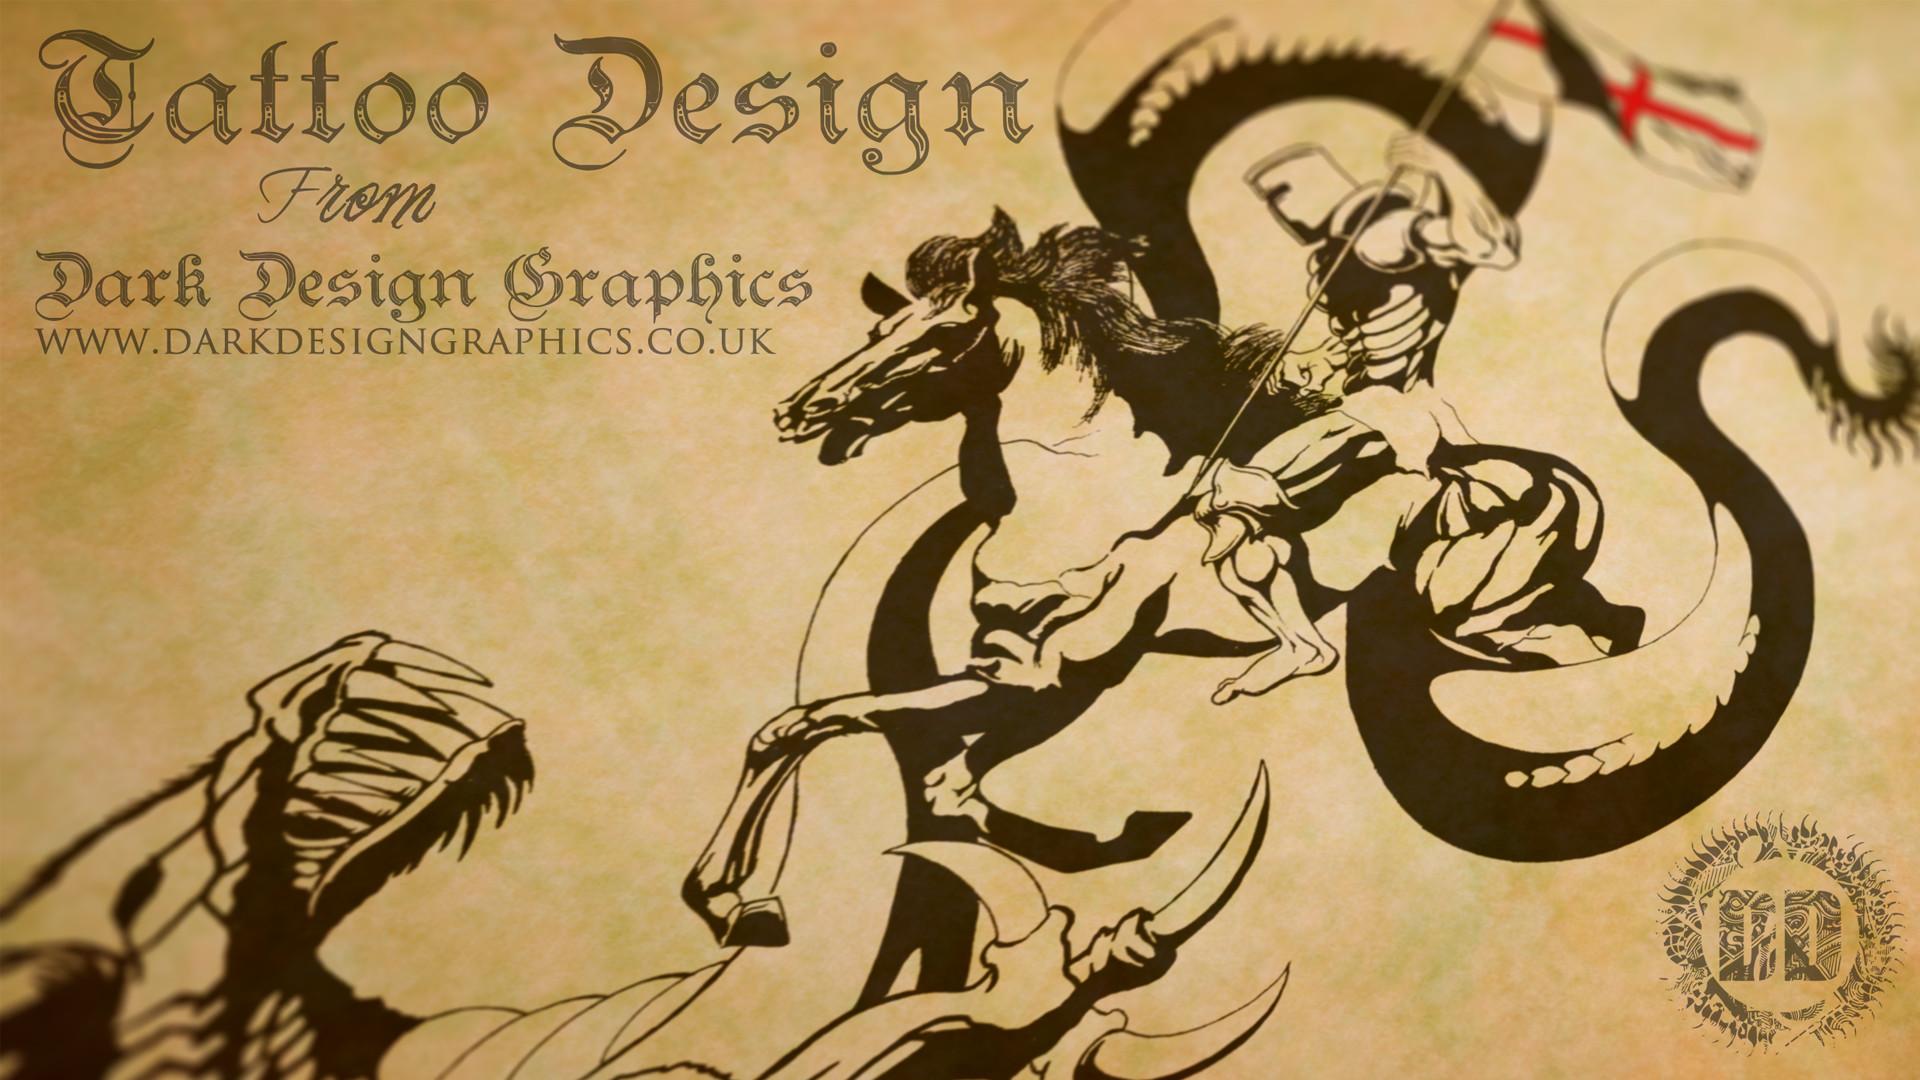 Res: 1920x1080, ... 1920×1080. Saint George Wallpaper from Dark Design Graphics